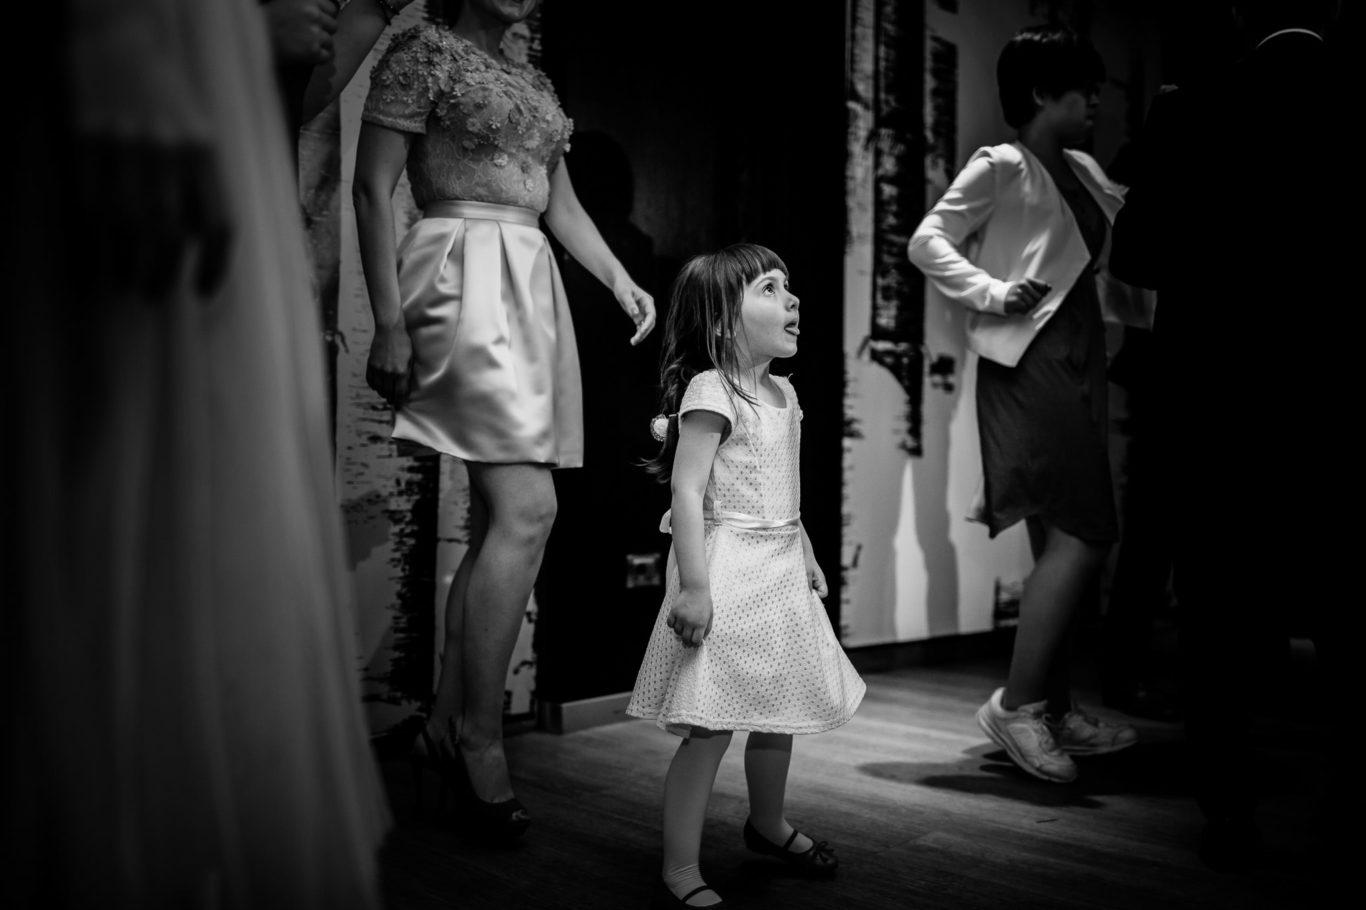 0837-Fotografie-nunta-Simona-Valentin-fotograf-Ciprian-Dumitrescu-CDF_0856 (2)